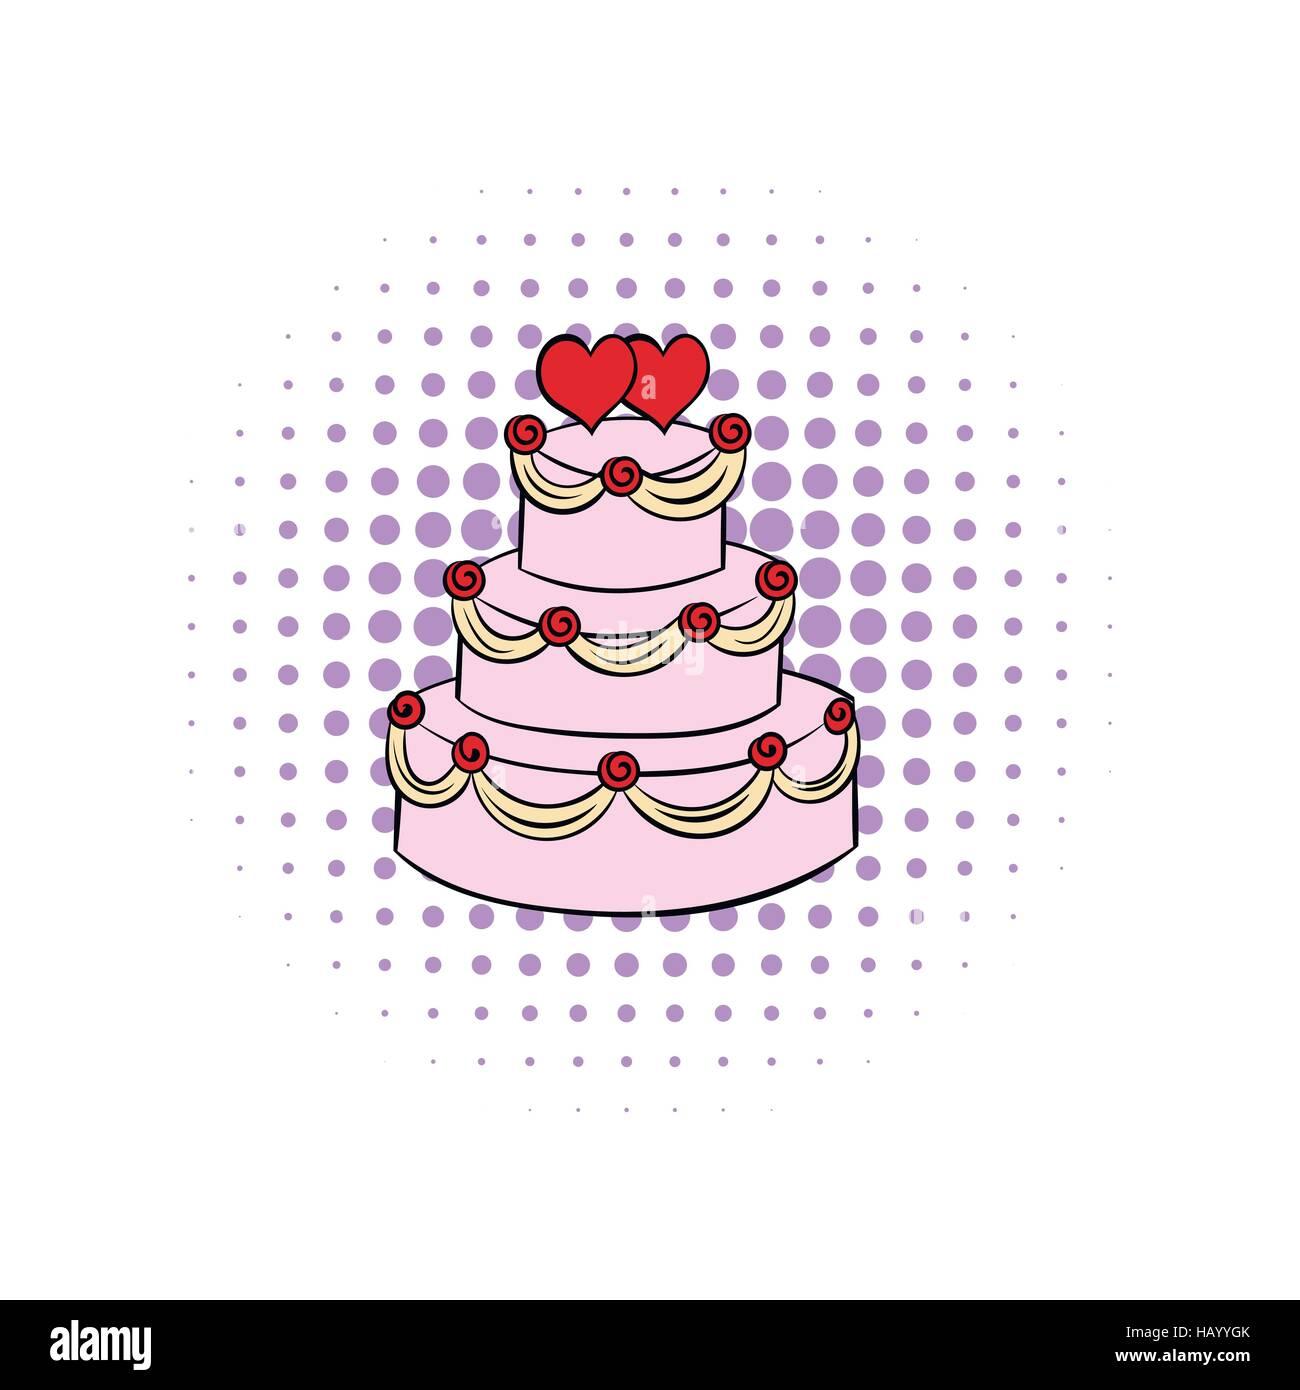 Hochzeitstorte Comics Symbol Vektor Abbildung Bild 127233475 Alamy